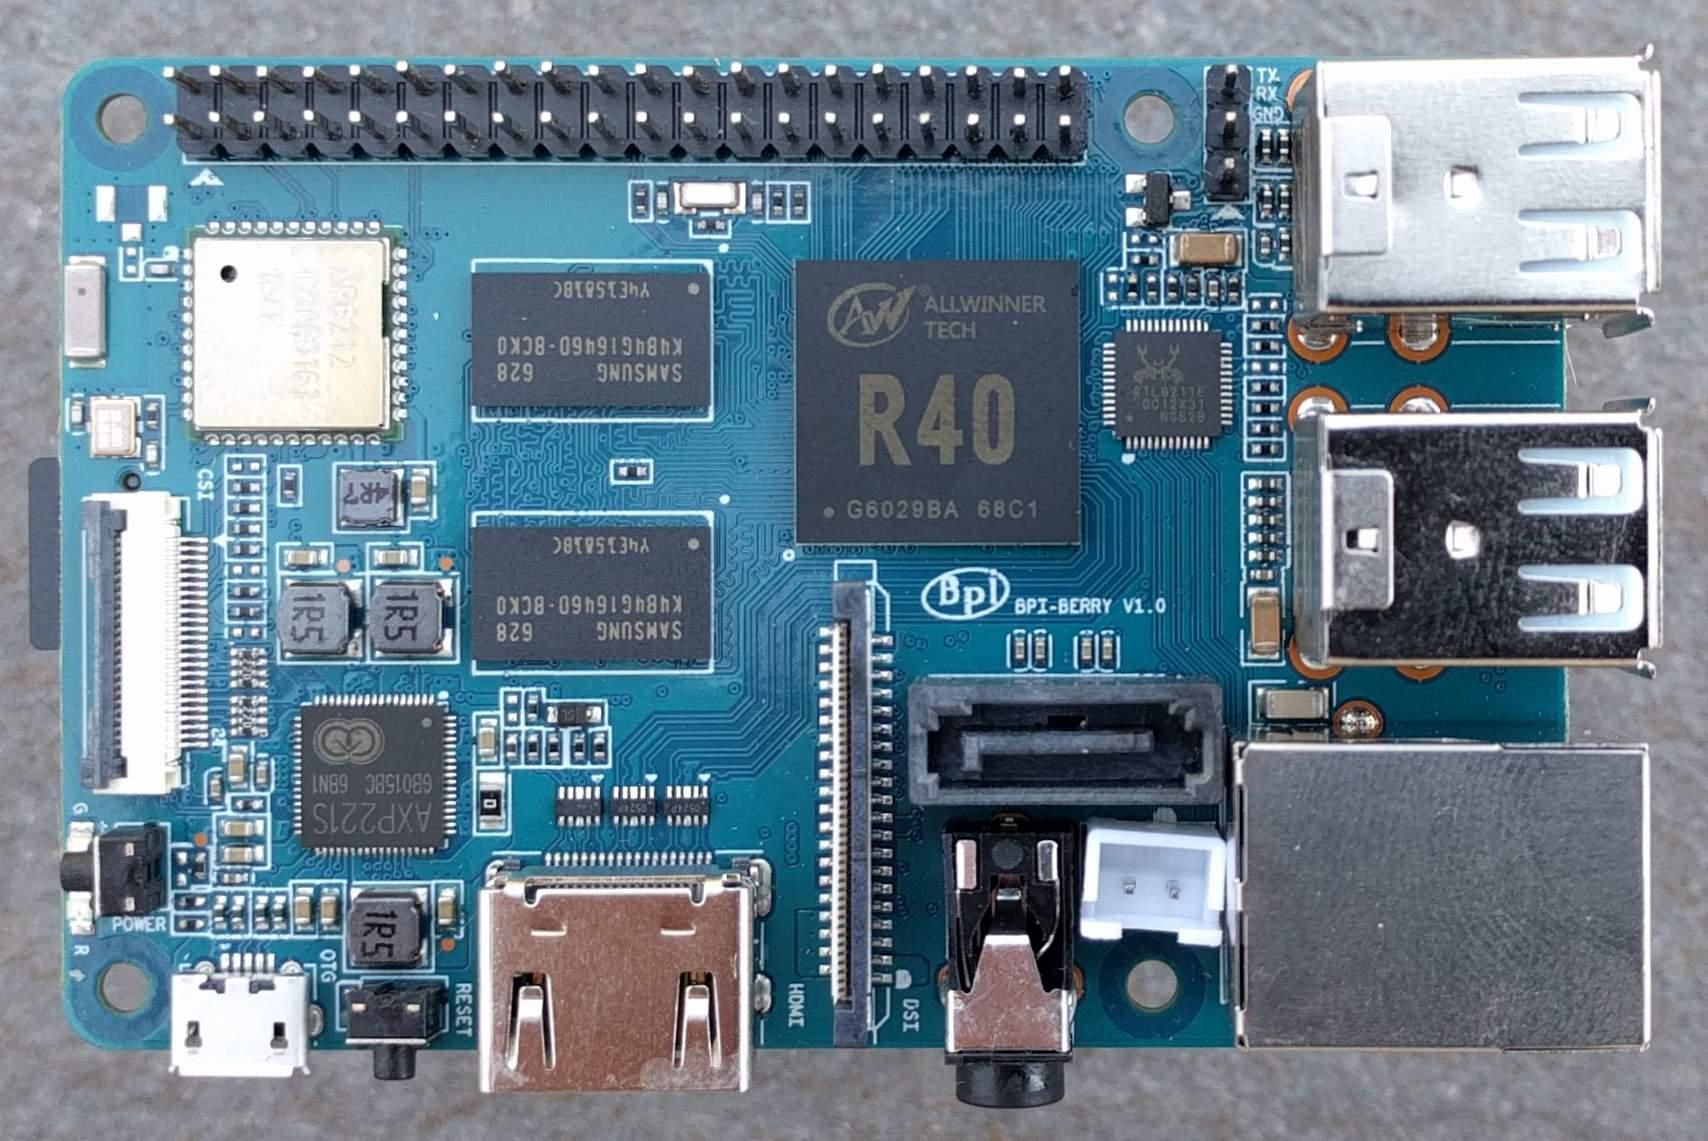 Best cheap hardware to run Nextcloud on? - appliances